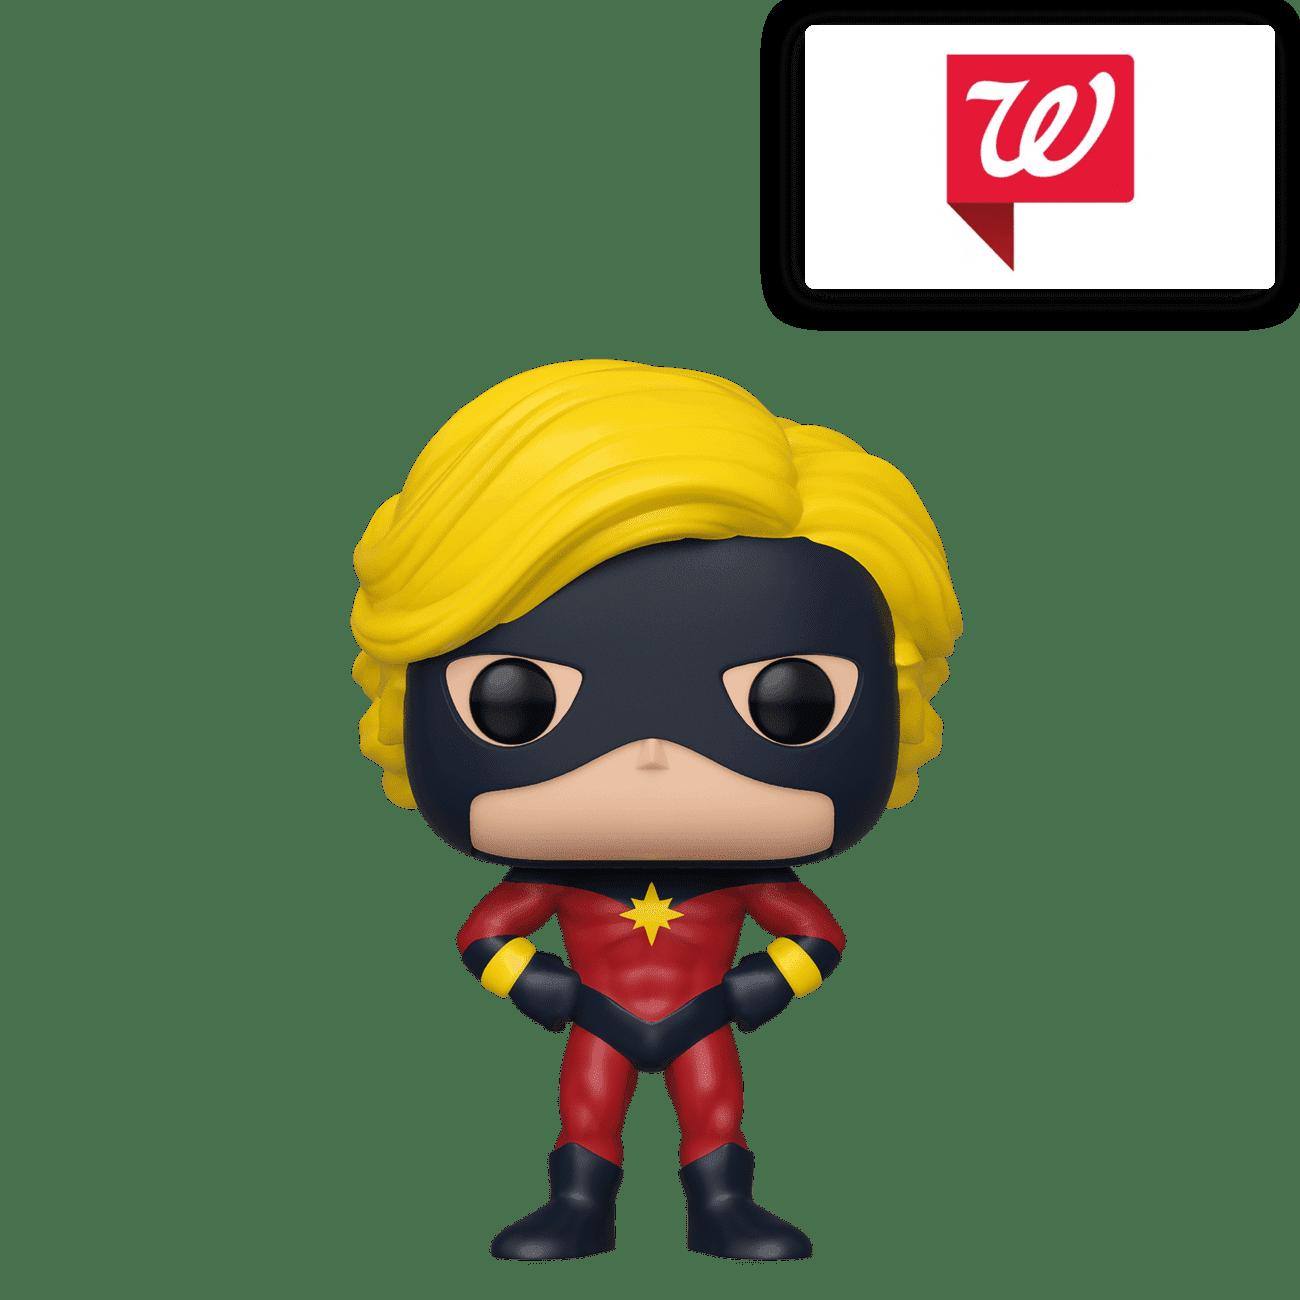 Funko Pop Captain Mar-Vell NYCC 2019